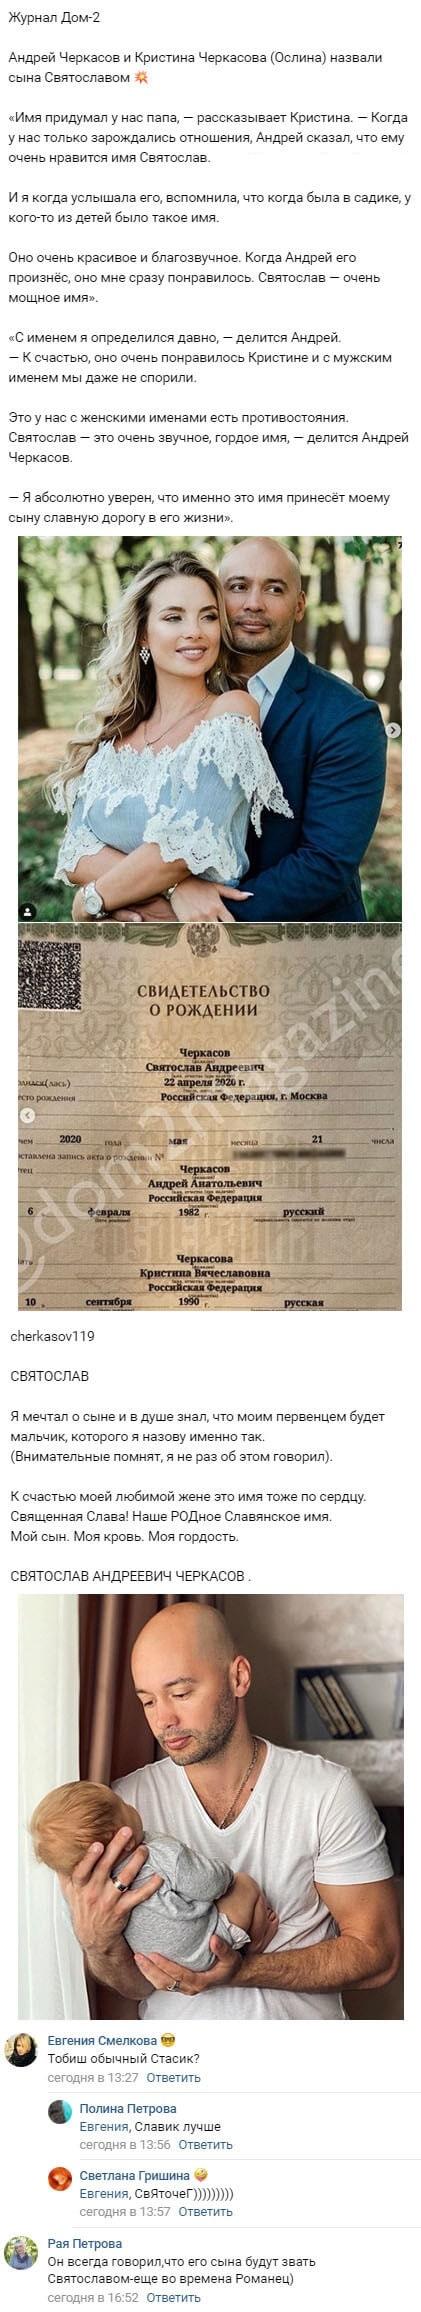 Андрей Черкасов наконец объявил имя сына